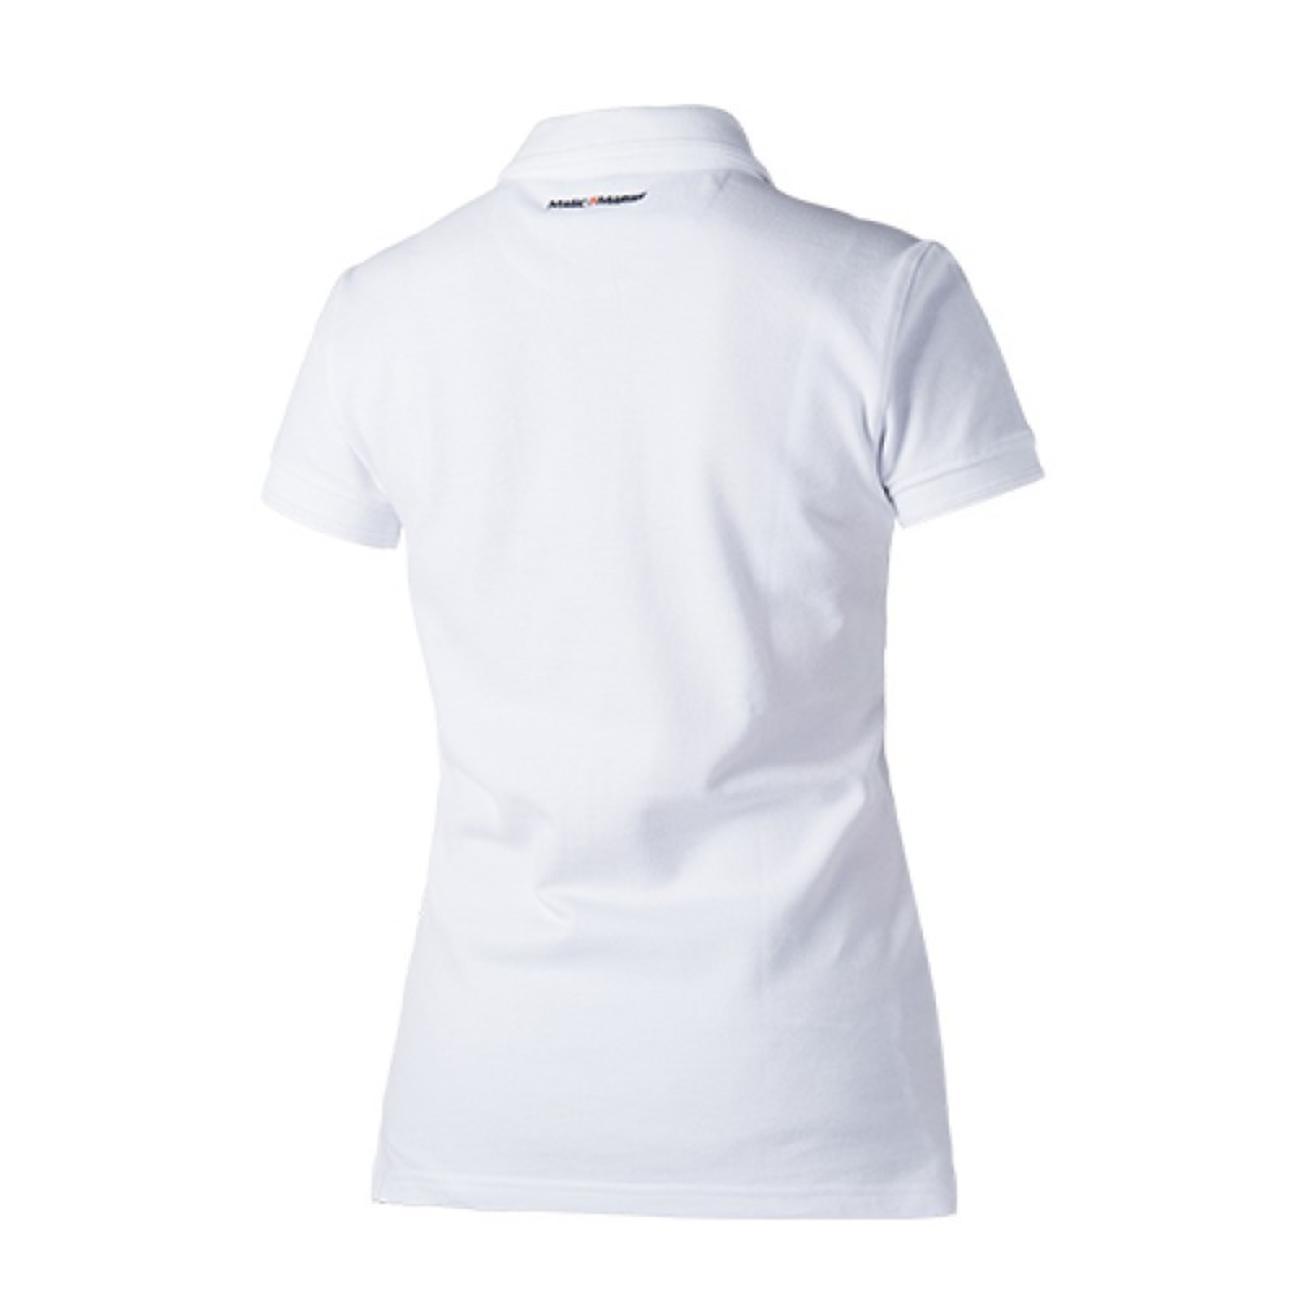 Gust Polo 無地ロゴ入り半袖ポロシャツ